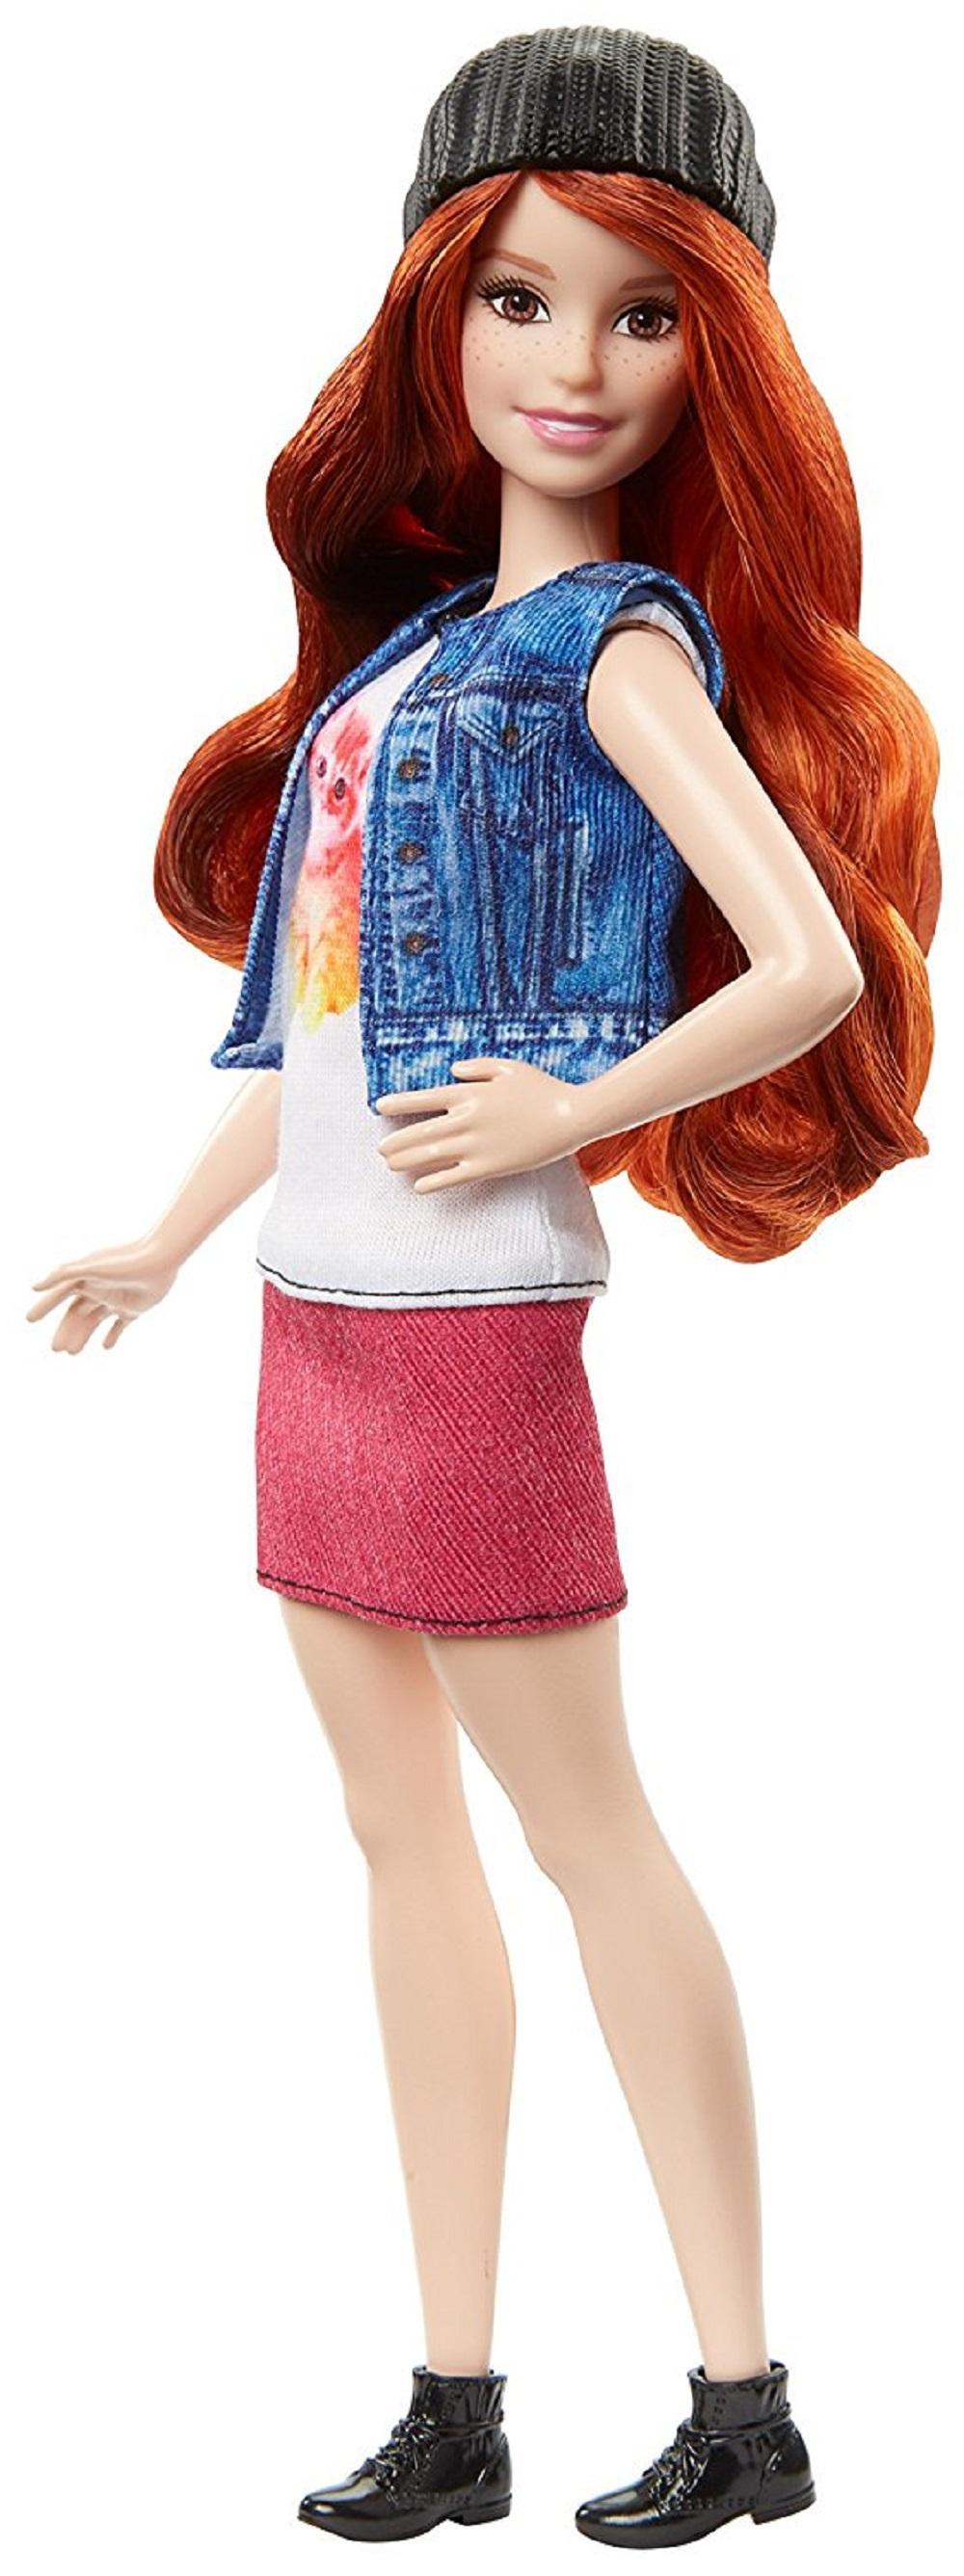 The Fashionomist The Hemline Index: Amazon.com: Barbie Fashionistas Doll 47